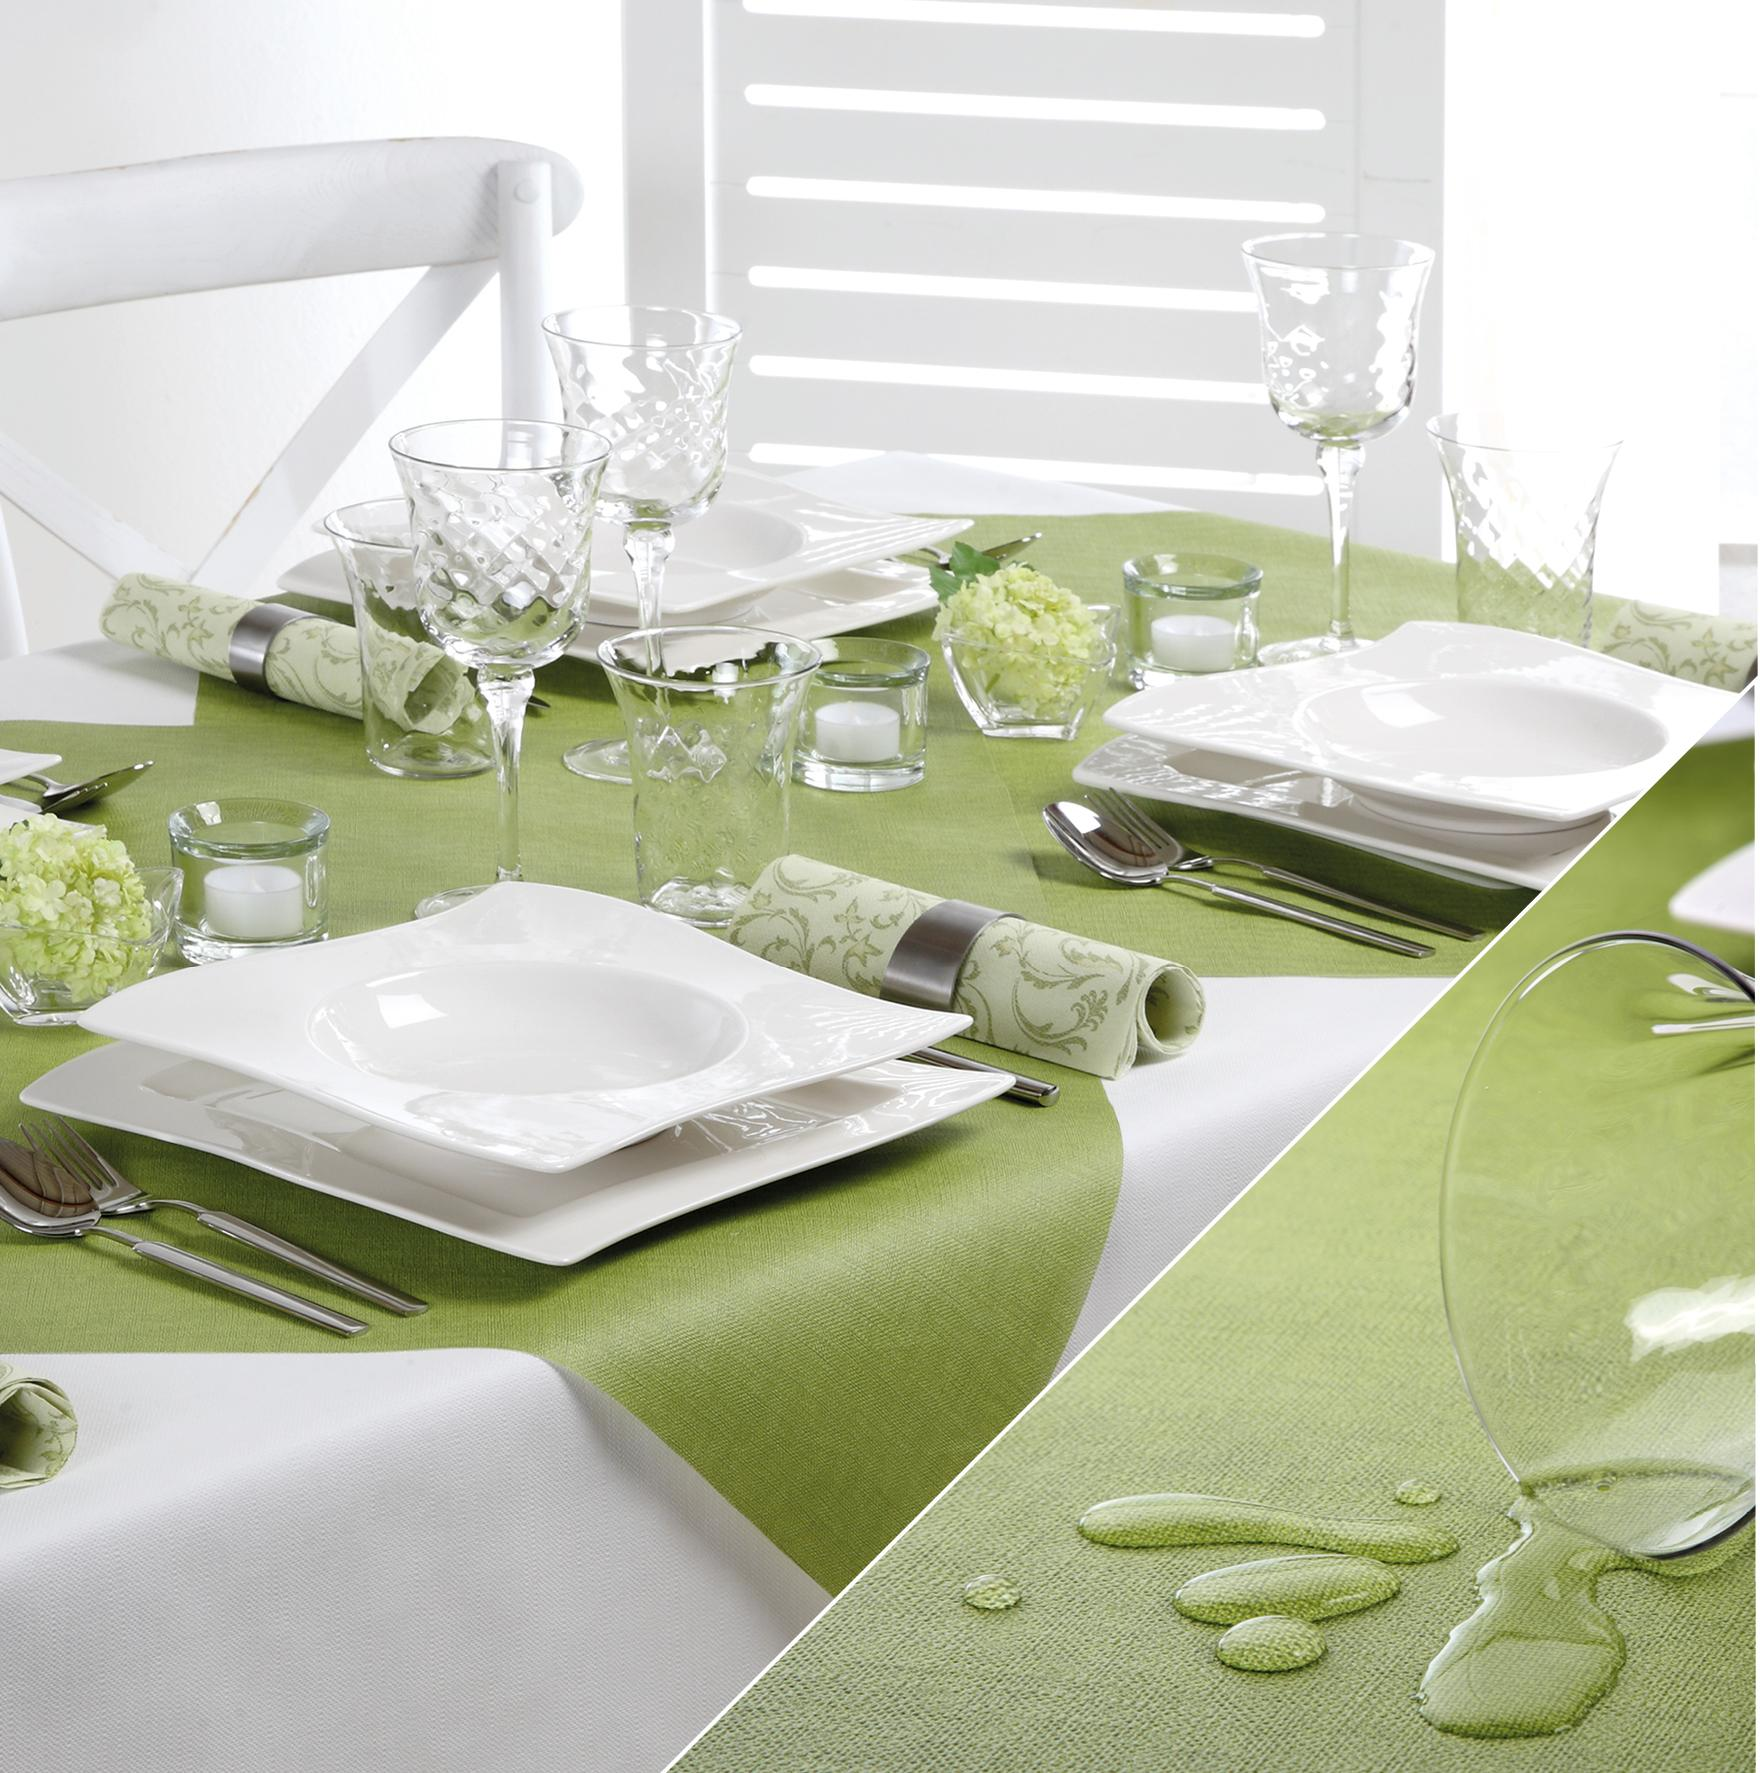 Image result for žuto zelena dekoracija stola